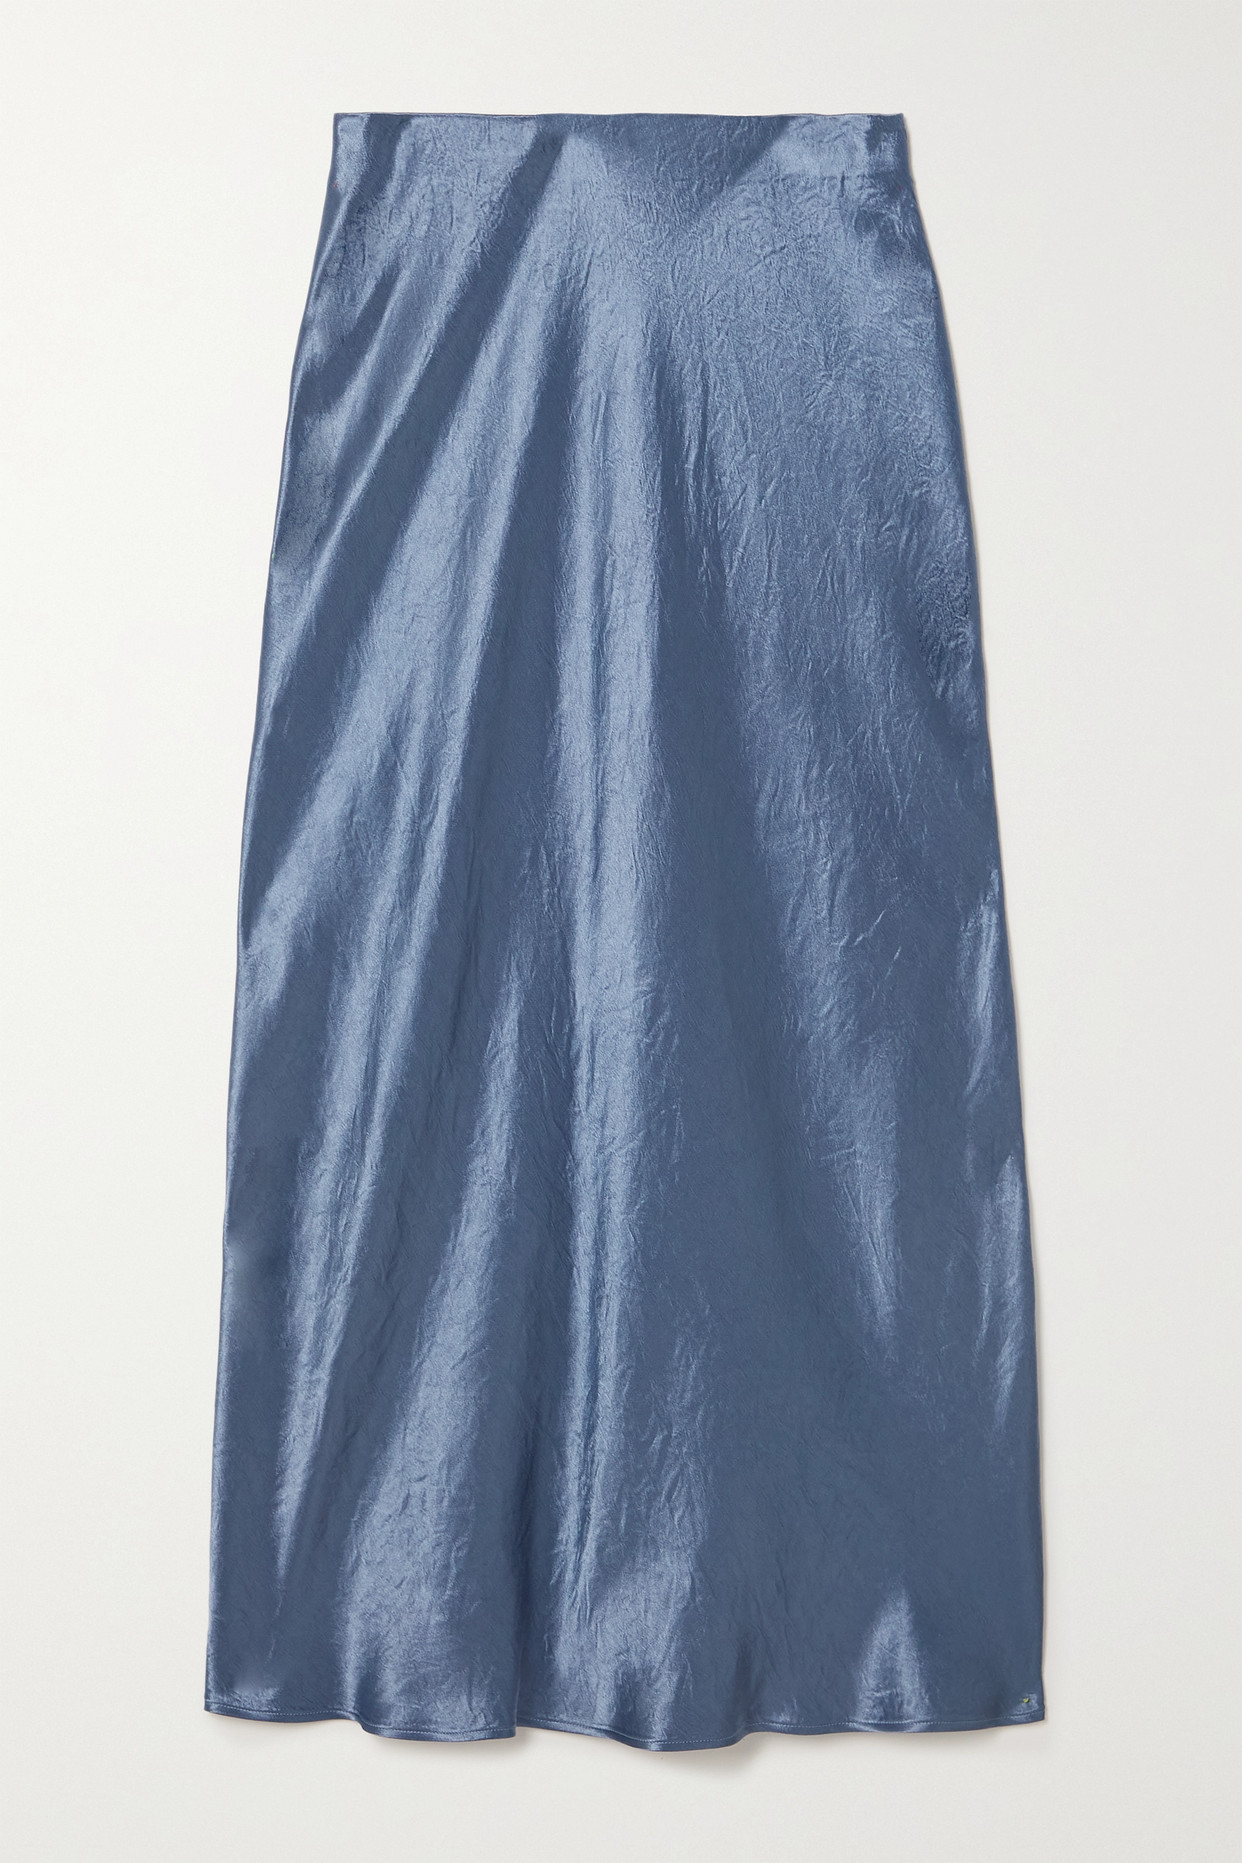 MAX MARA - + Leisure Alessio Washed-satin Midi Skirt - Blue - UK2